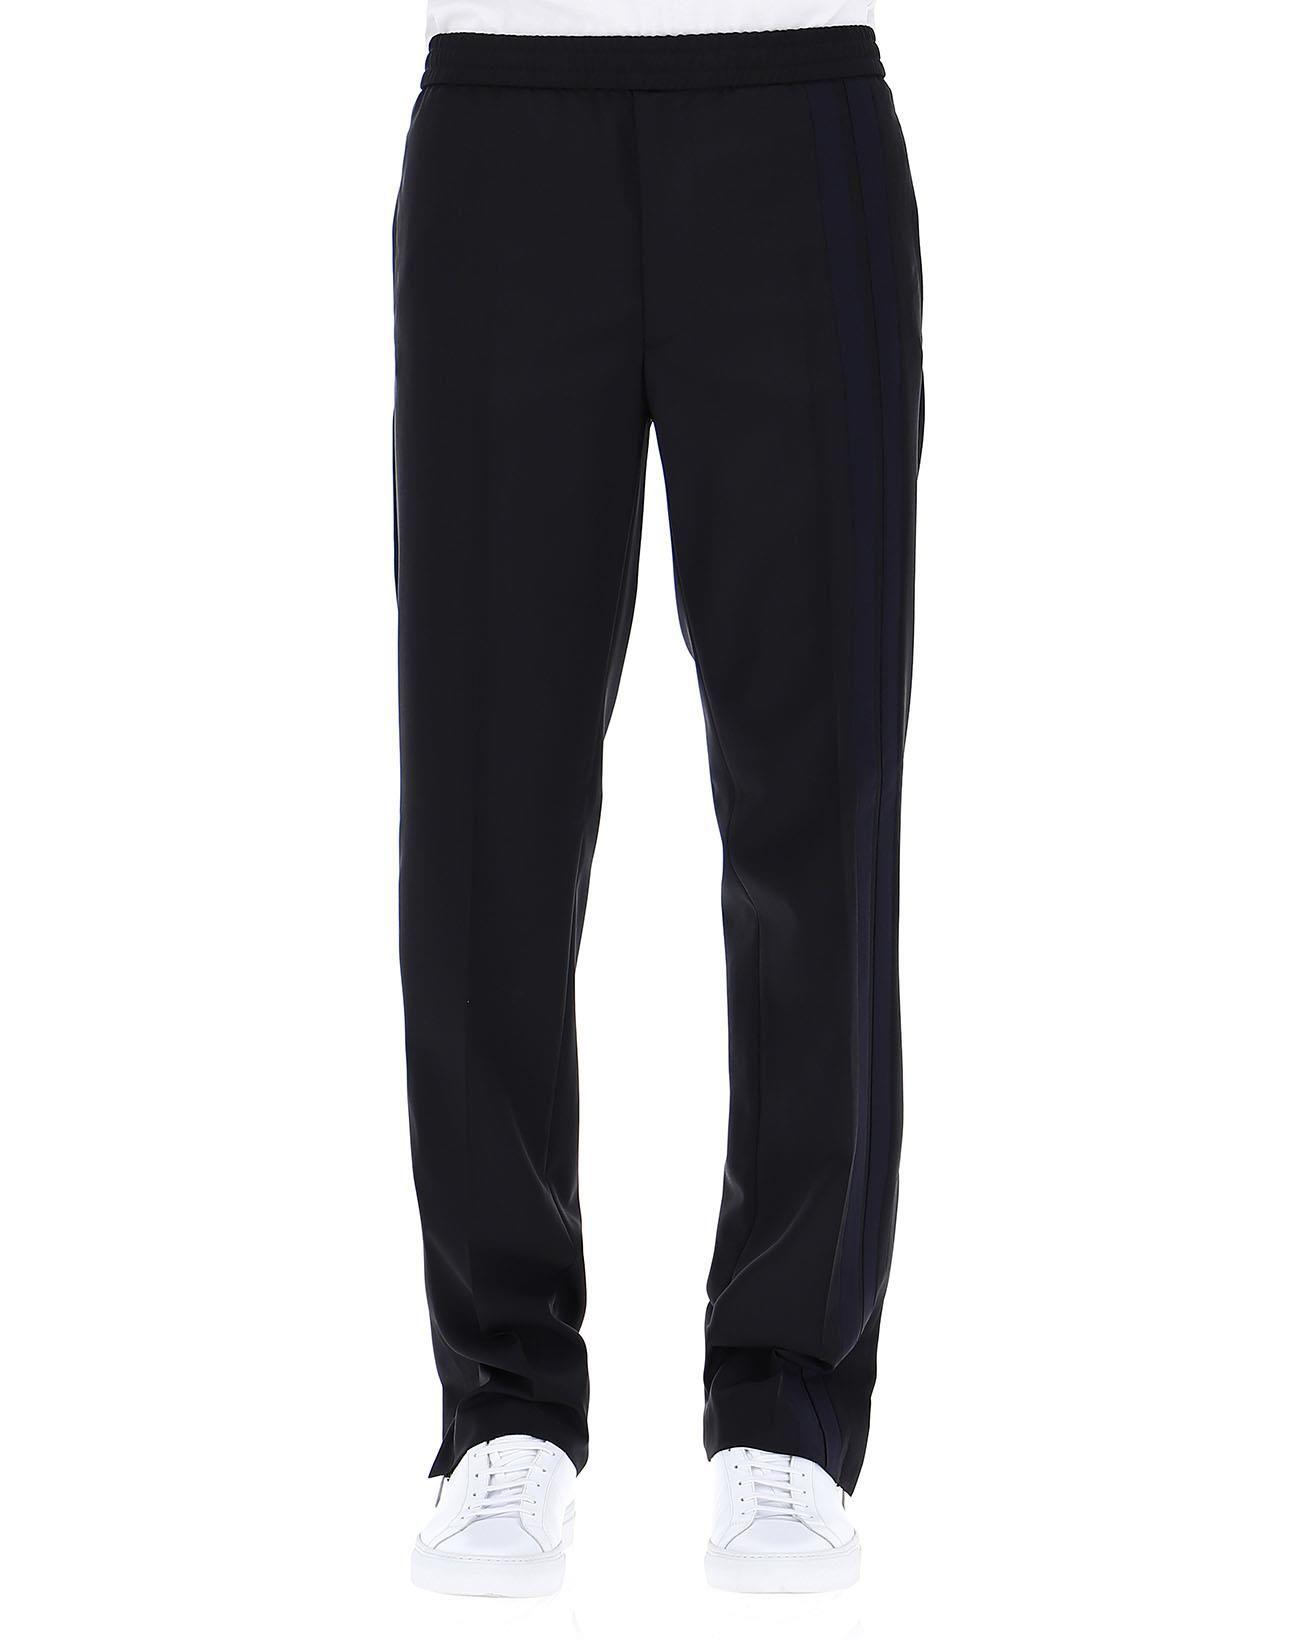 d2110b91e5b5 Valentino Black Wool Pants